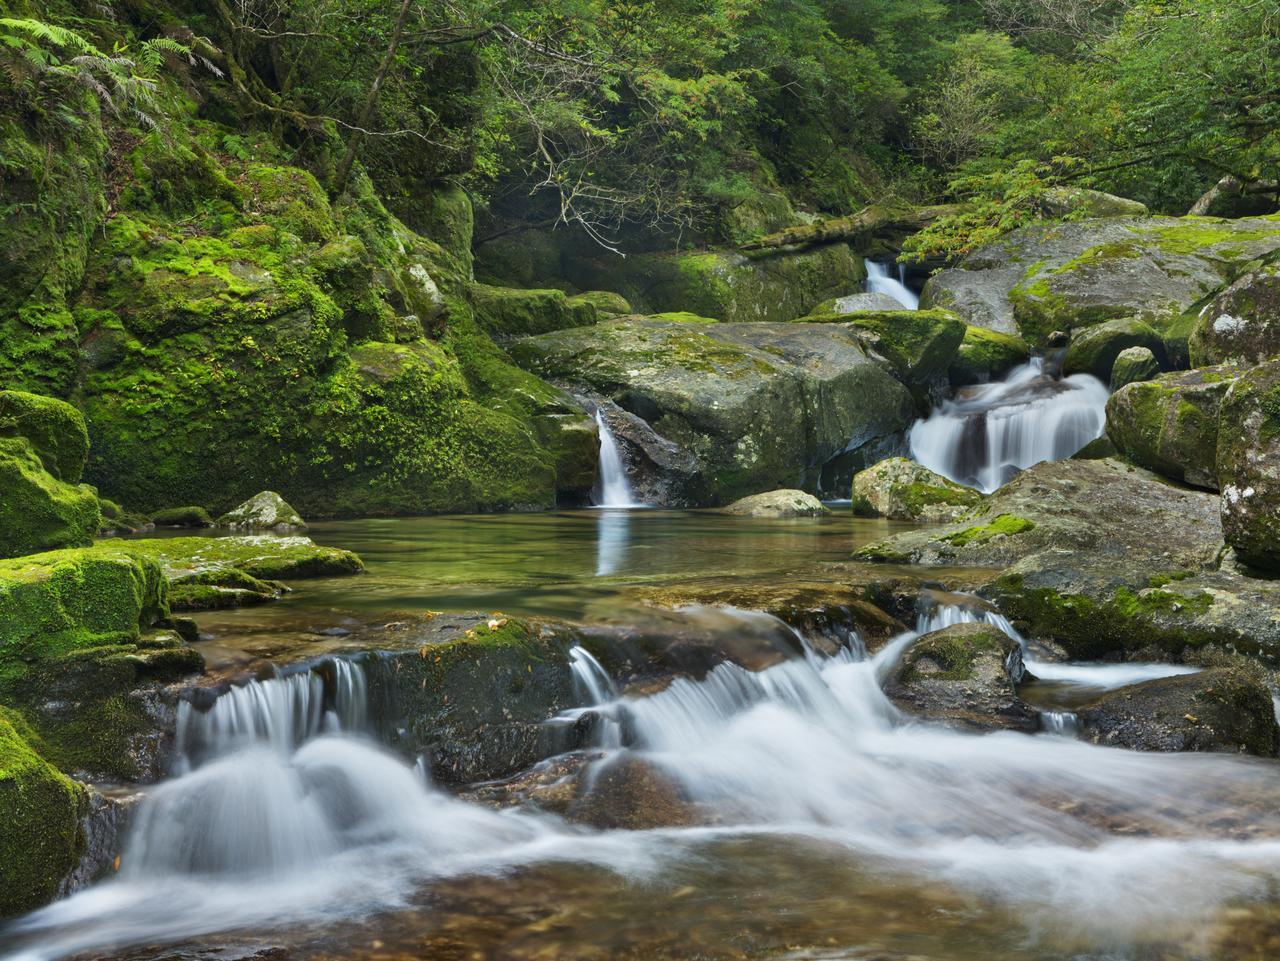 A river through lush rainforest on the southern island of Yakushima (???), Japan.